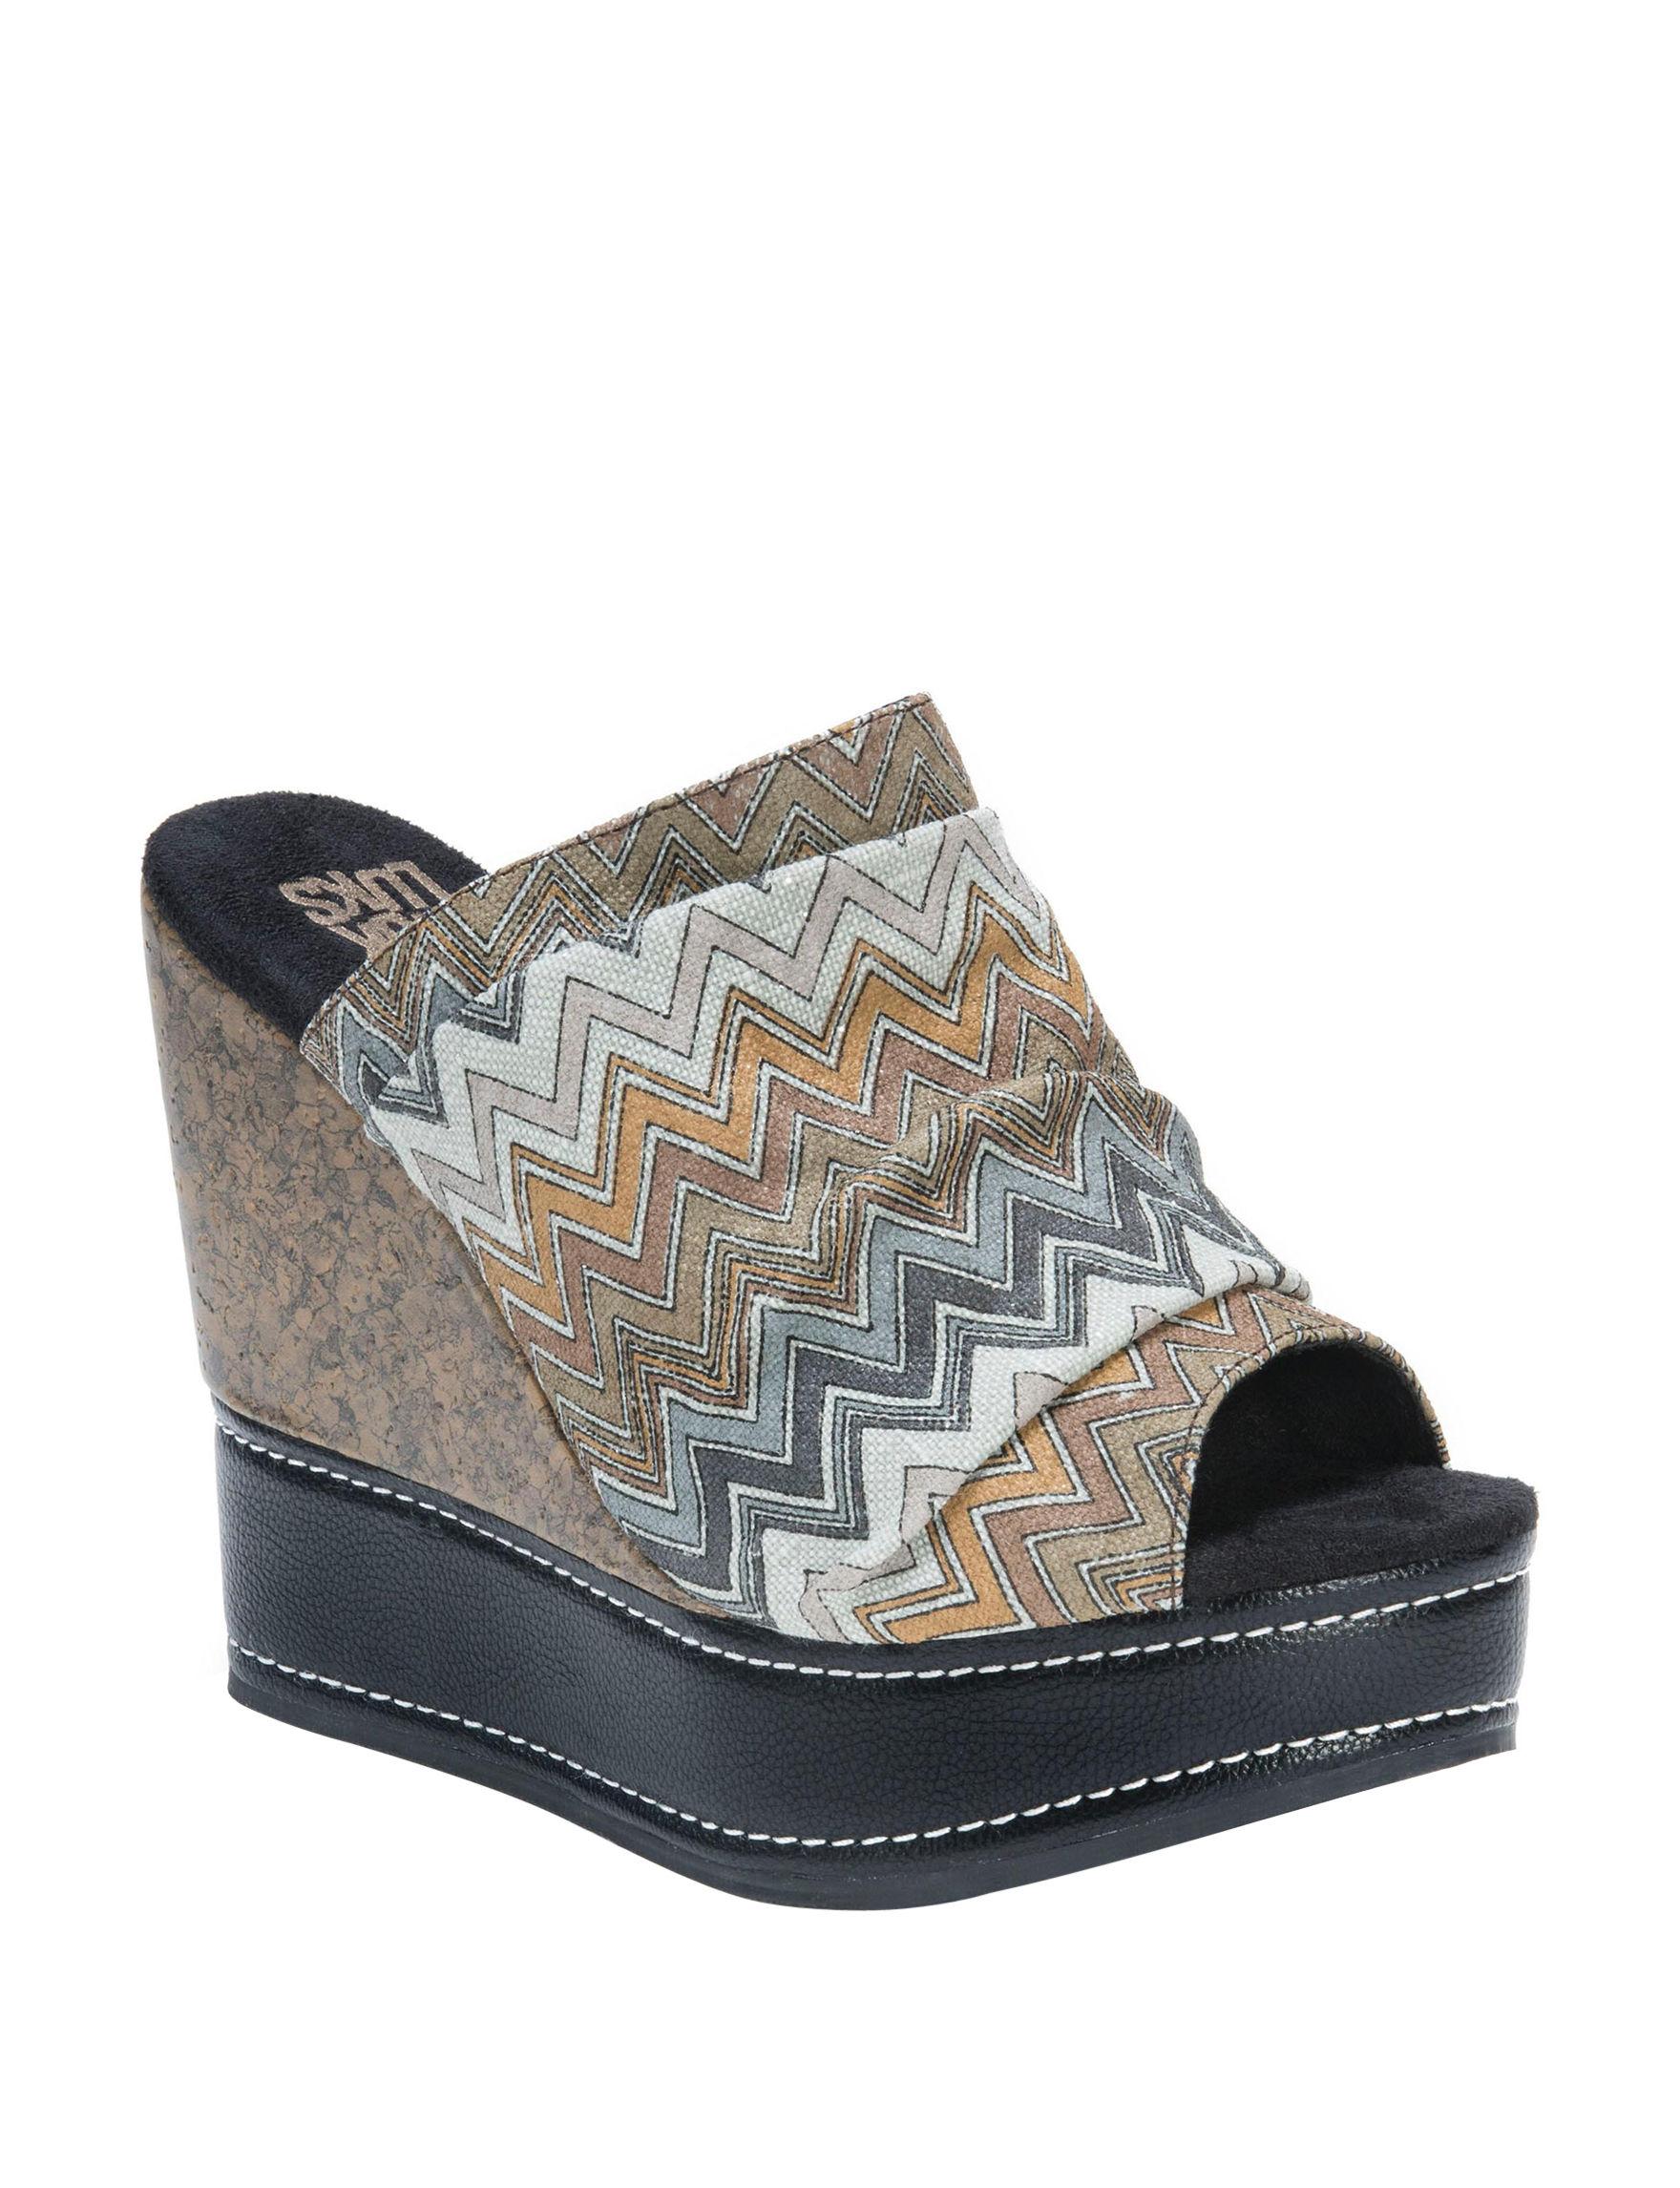 Muk Luks Grey Wedge Sandals